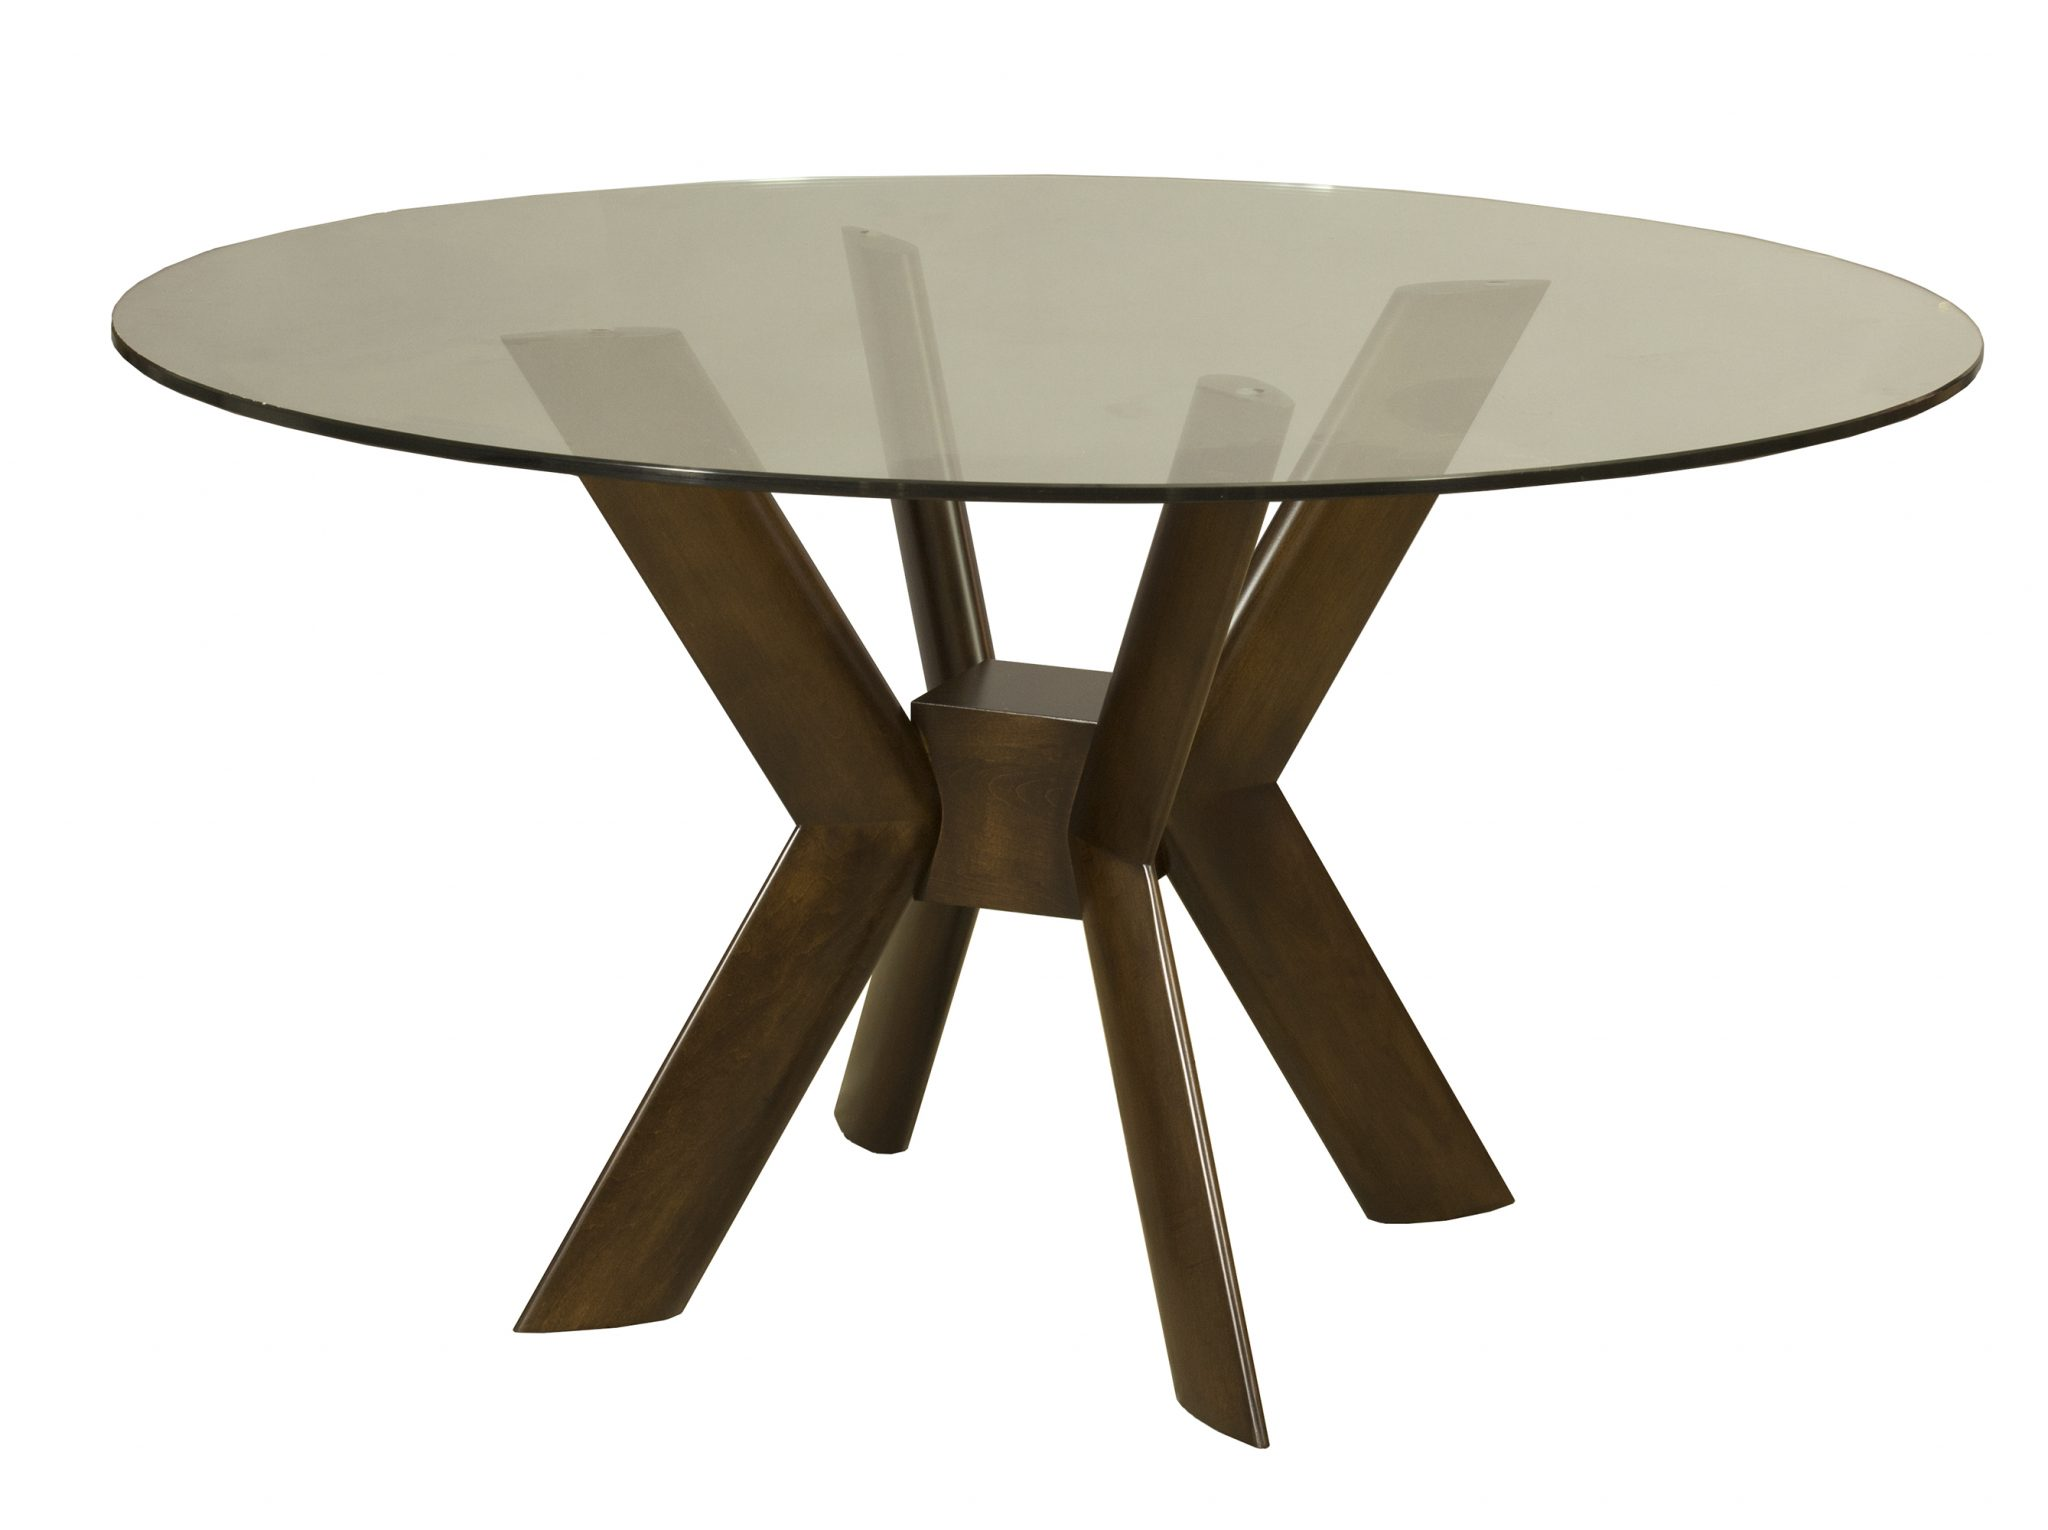 K Base Glass Dining Table – Saloom Furniture pany